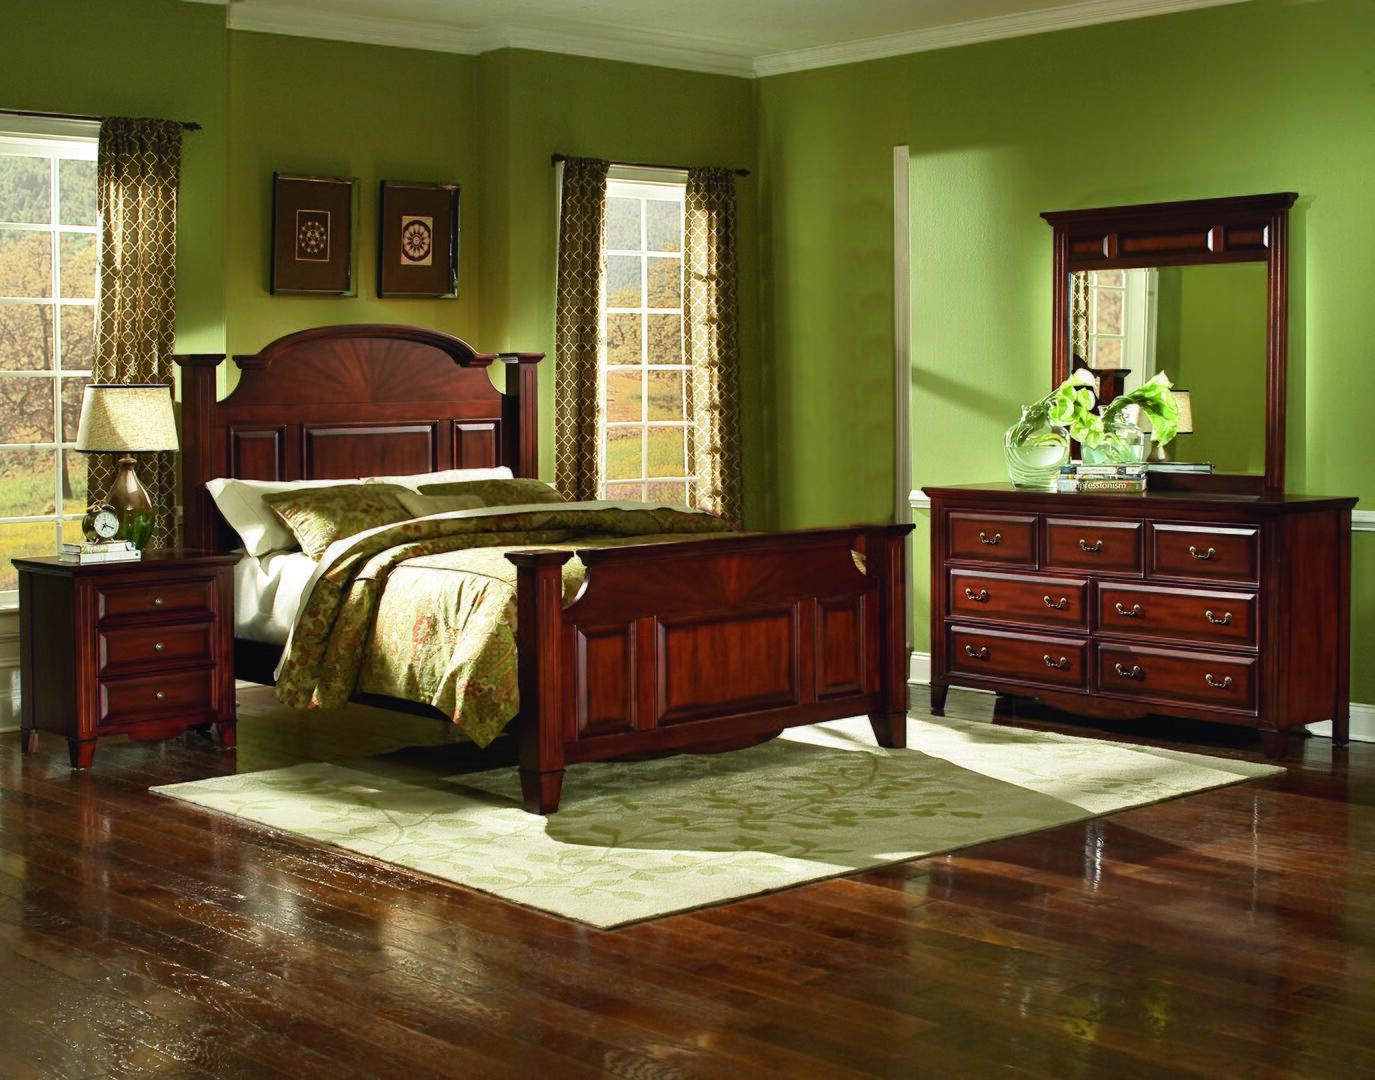 New classic home furnishings 6740wbdmn clark inchs Classic home appliance films